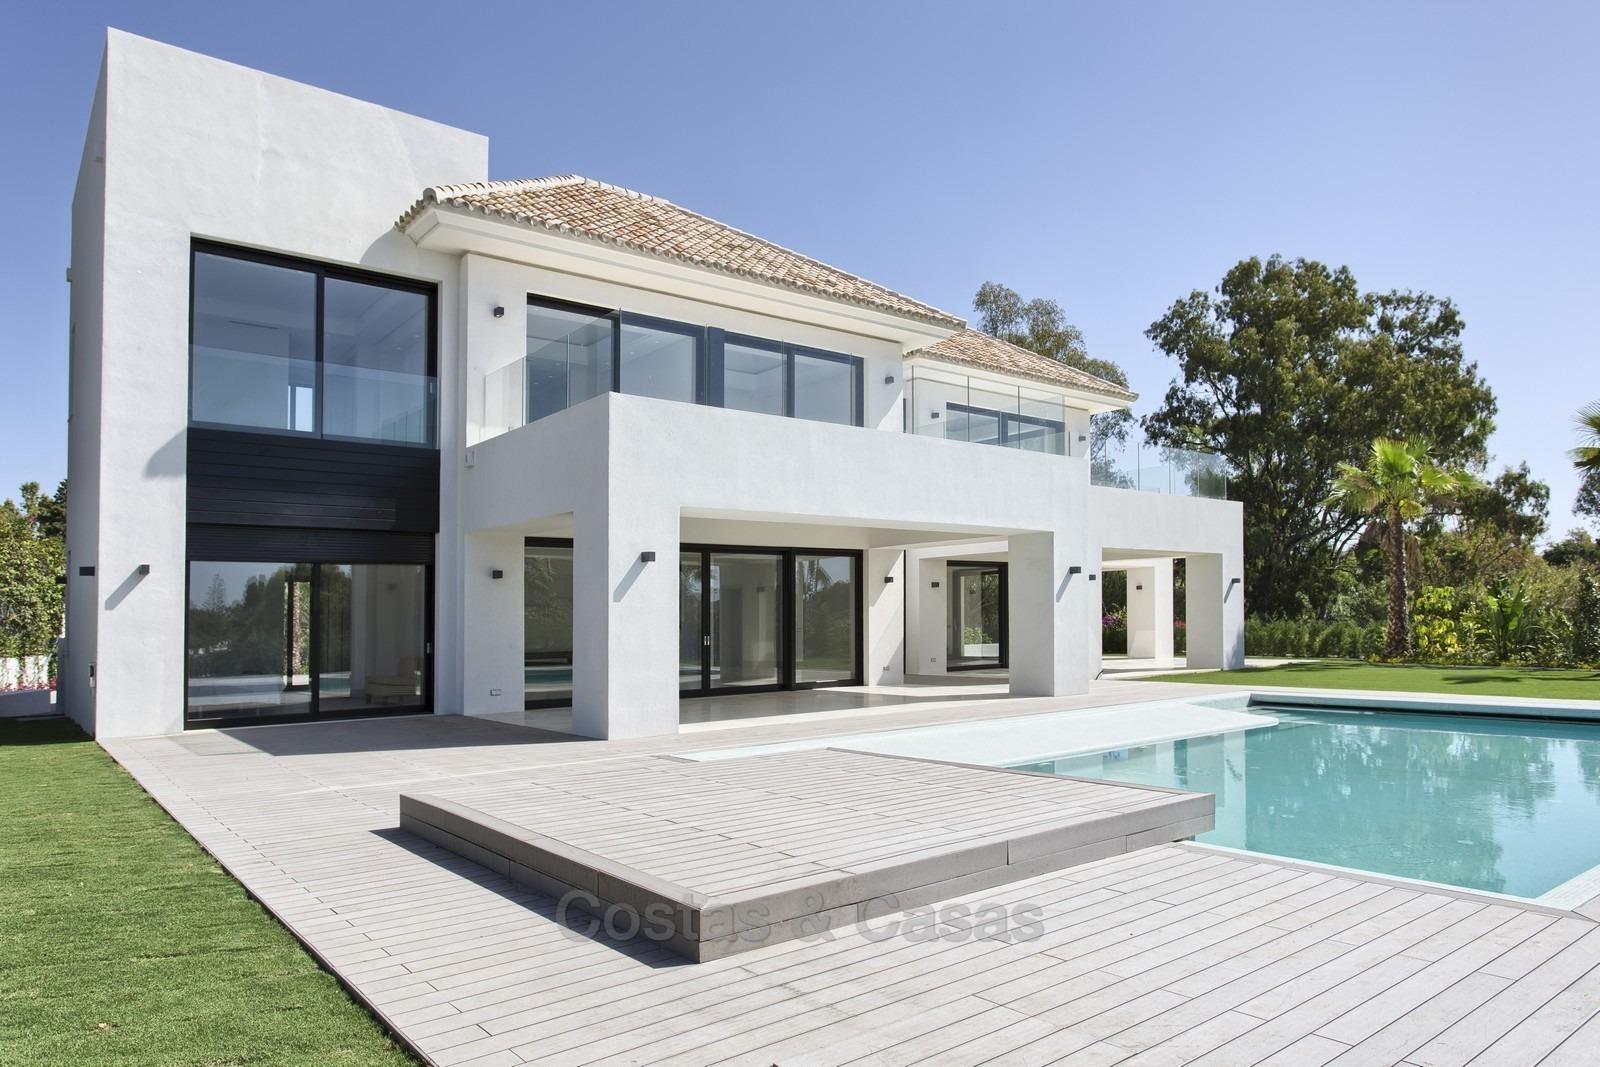 Brand new beachside contemporary style villa for sale ready to move in fullscreen